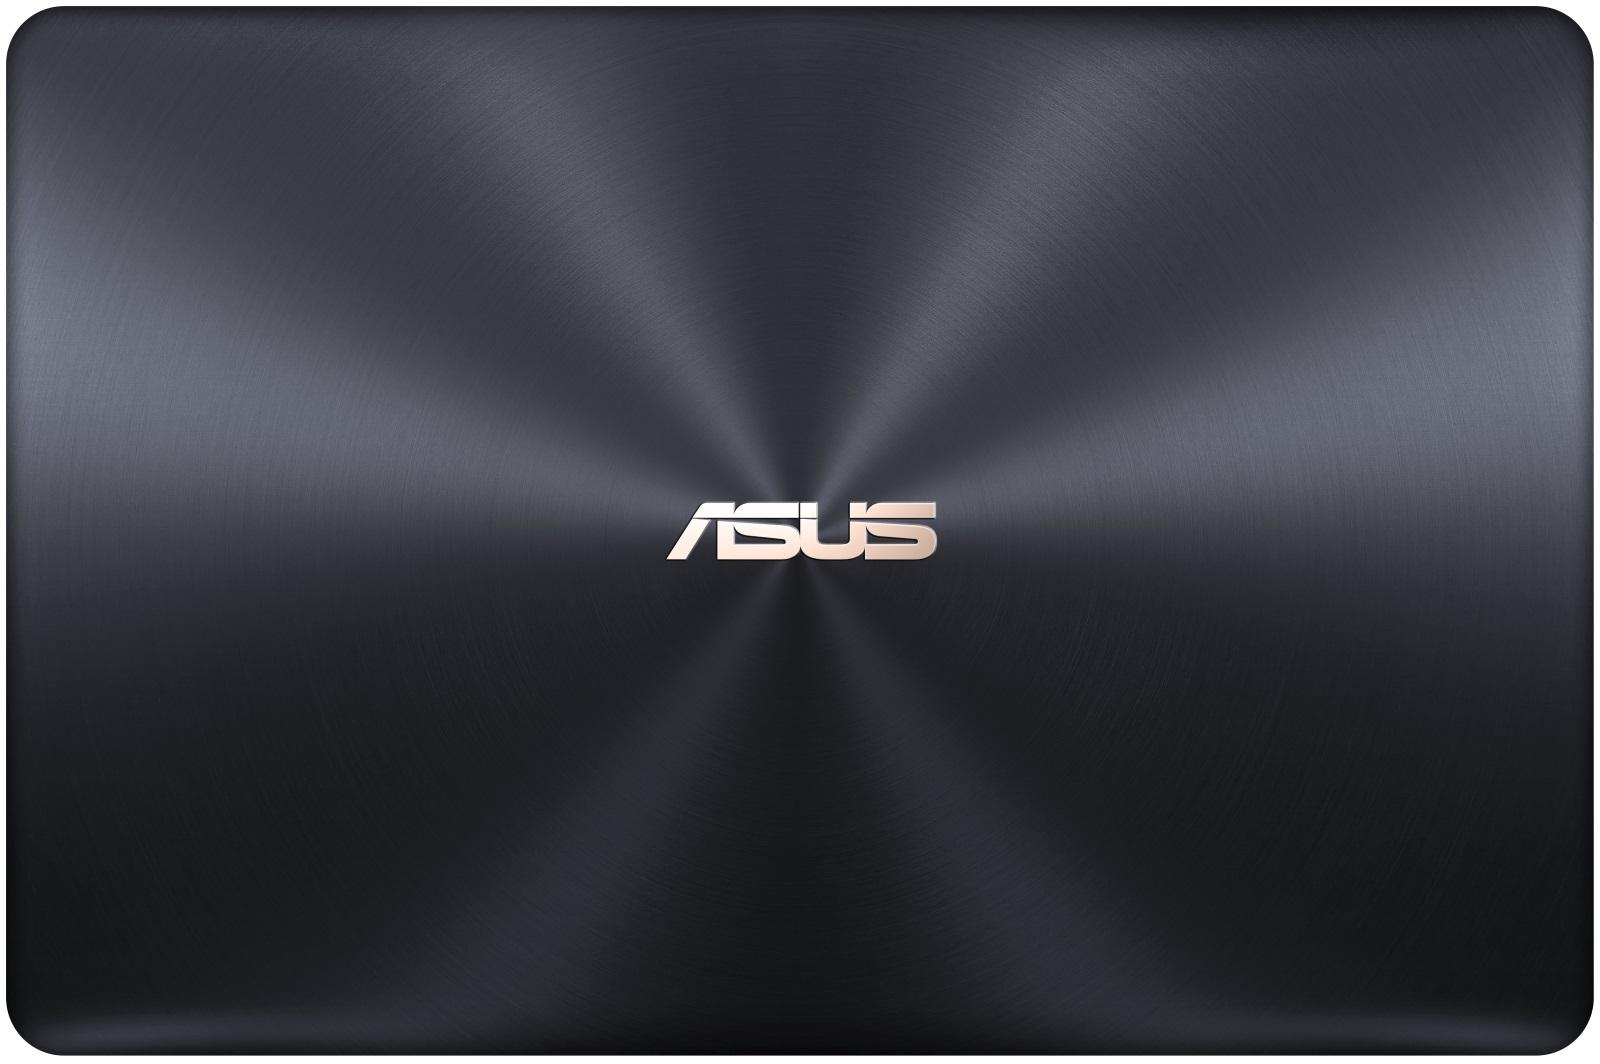 "15.6"" ASUS ZenBook Pro 15 | Intel Core i7-8750H | NVIDIA GTX 1050 TI | 16GB RAM + 512GB SSD | image"